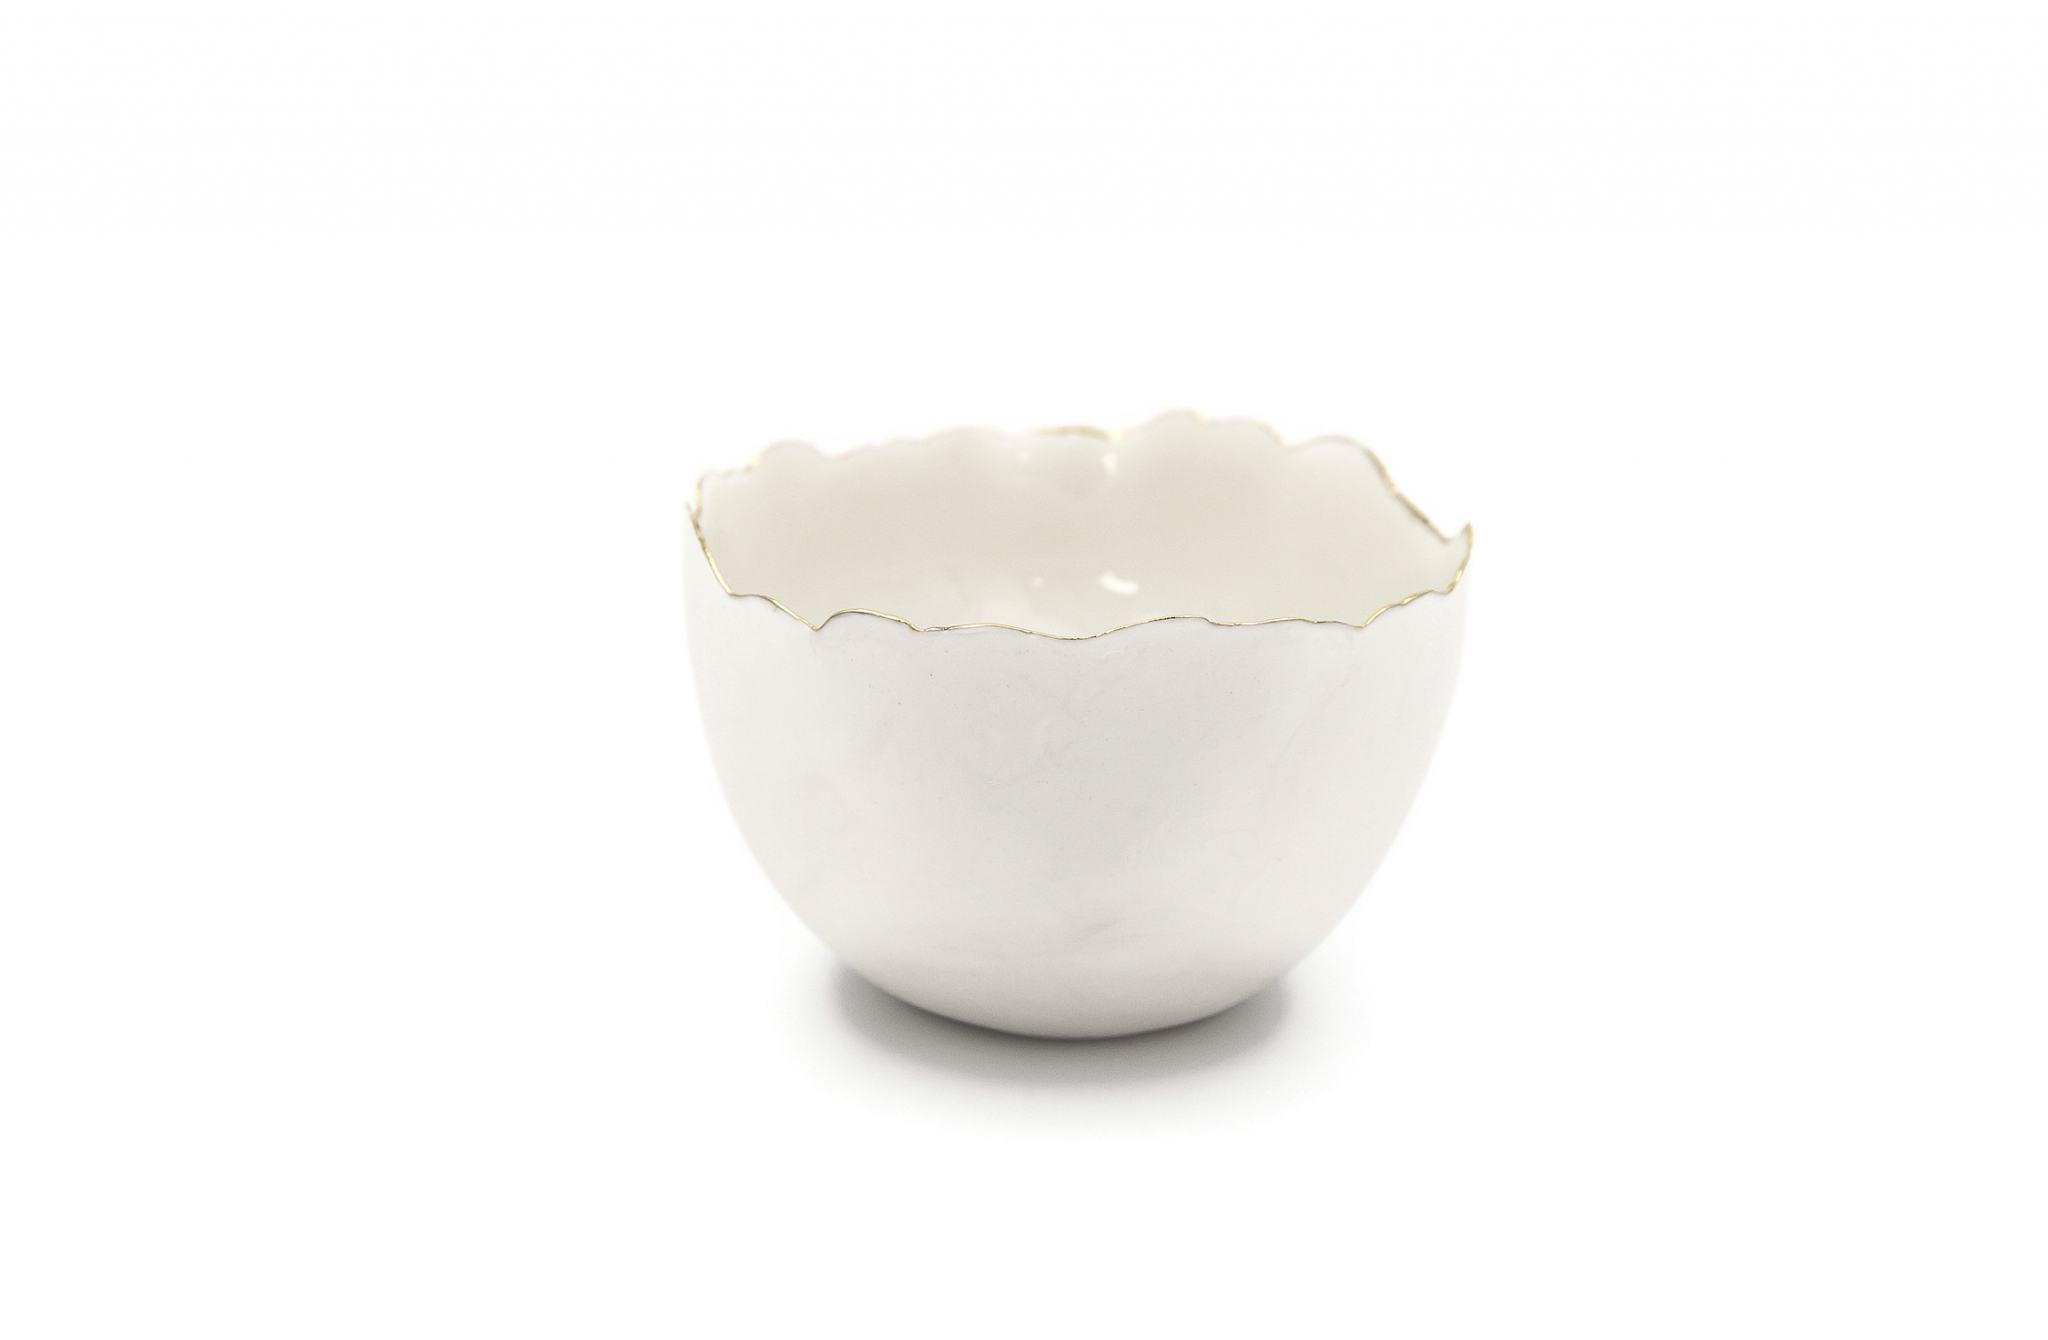 Collectible Porcelain White Bowl